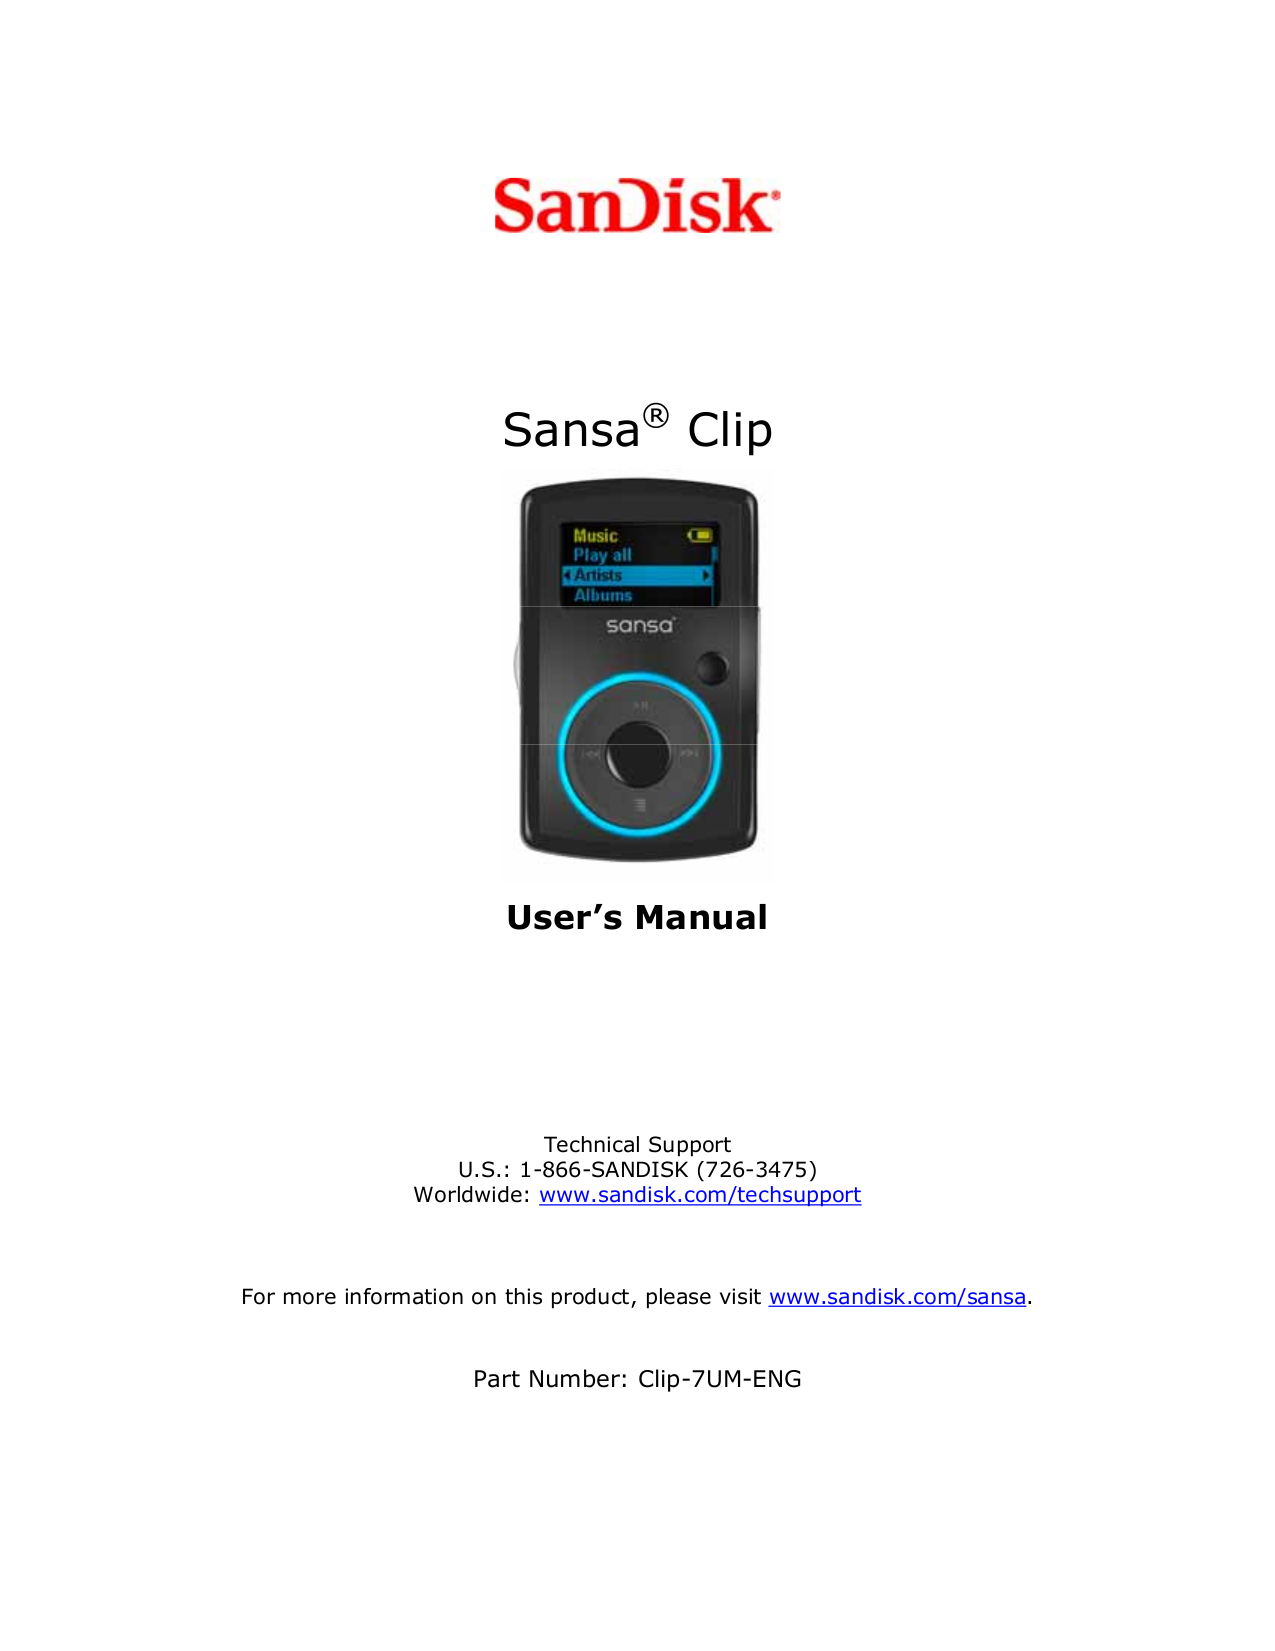 download free pdf for sandisk sansa sansa express 2gb mp3 player manual rh umlib com sandisk sansa express manual Sansa Owner's Manual